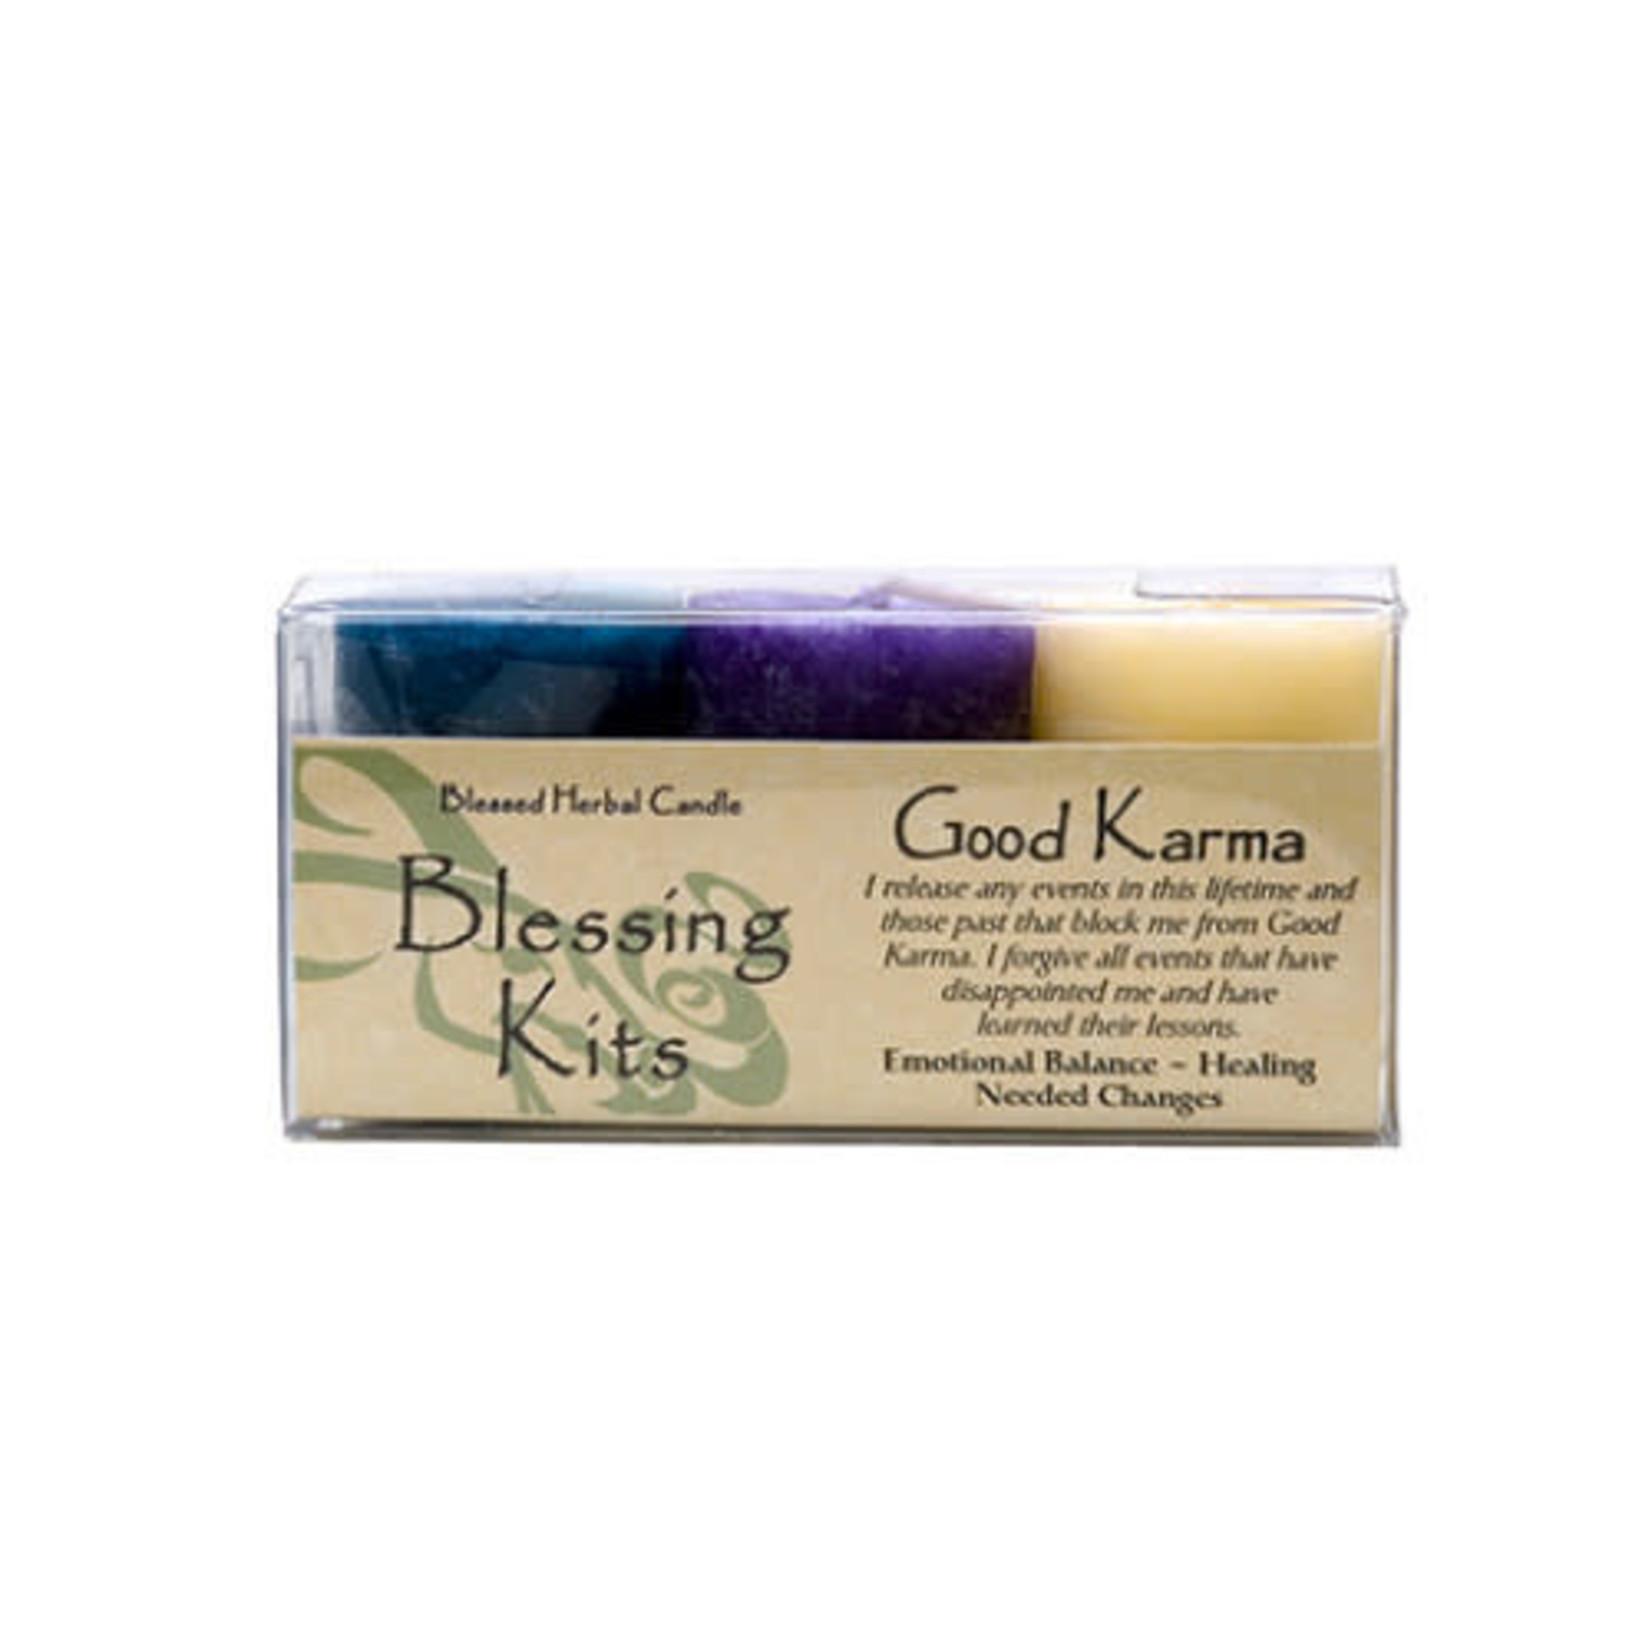 Blessed Kit Herbal Good Karma Candle Kit